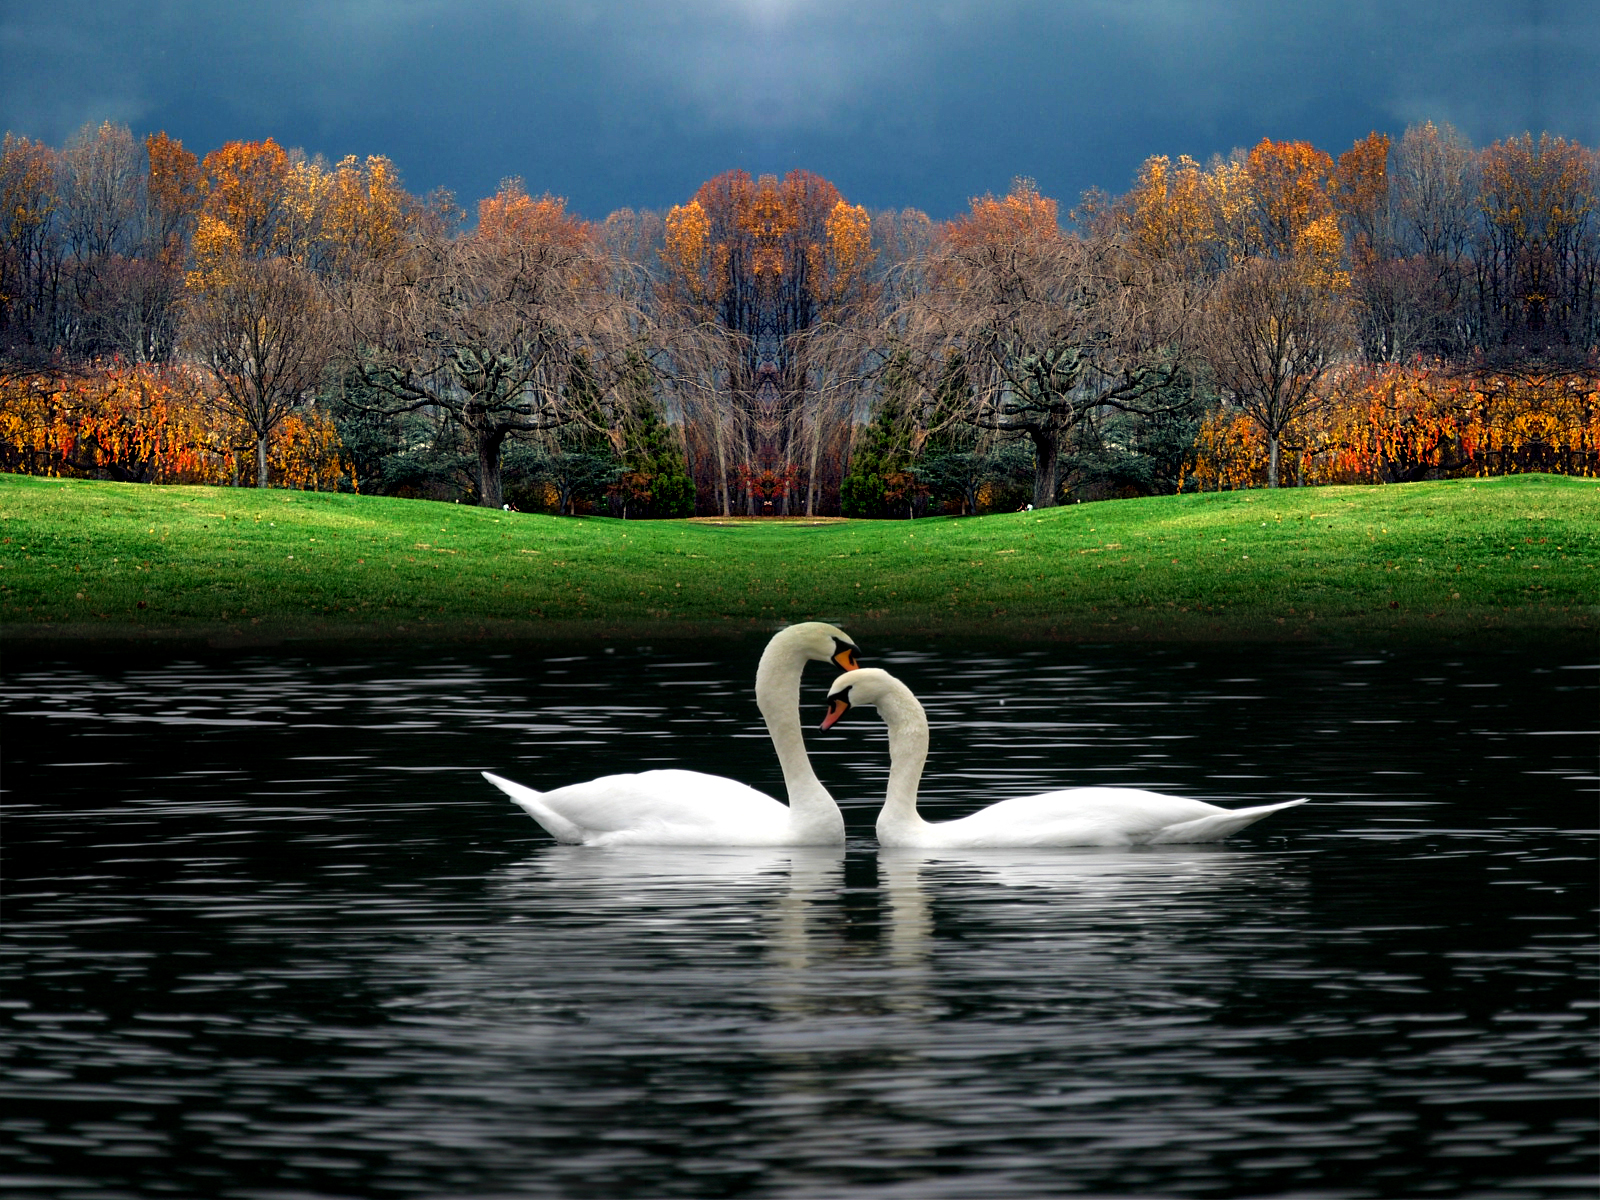 PicturesPool: Love Birds Wallpapers | Beautiful Birds Pictures